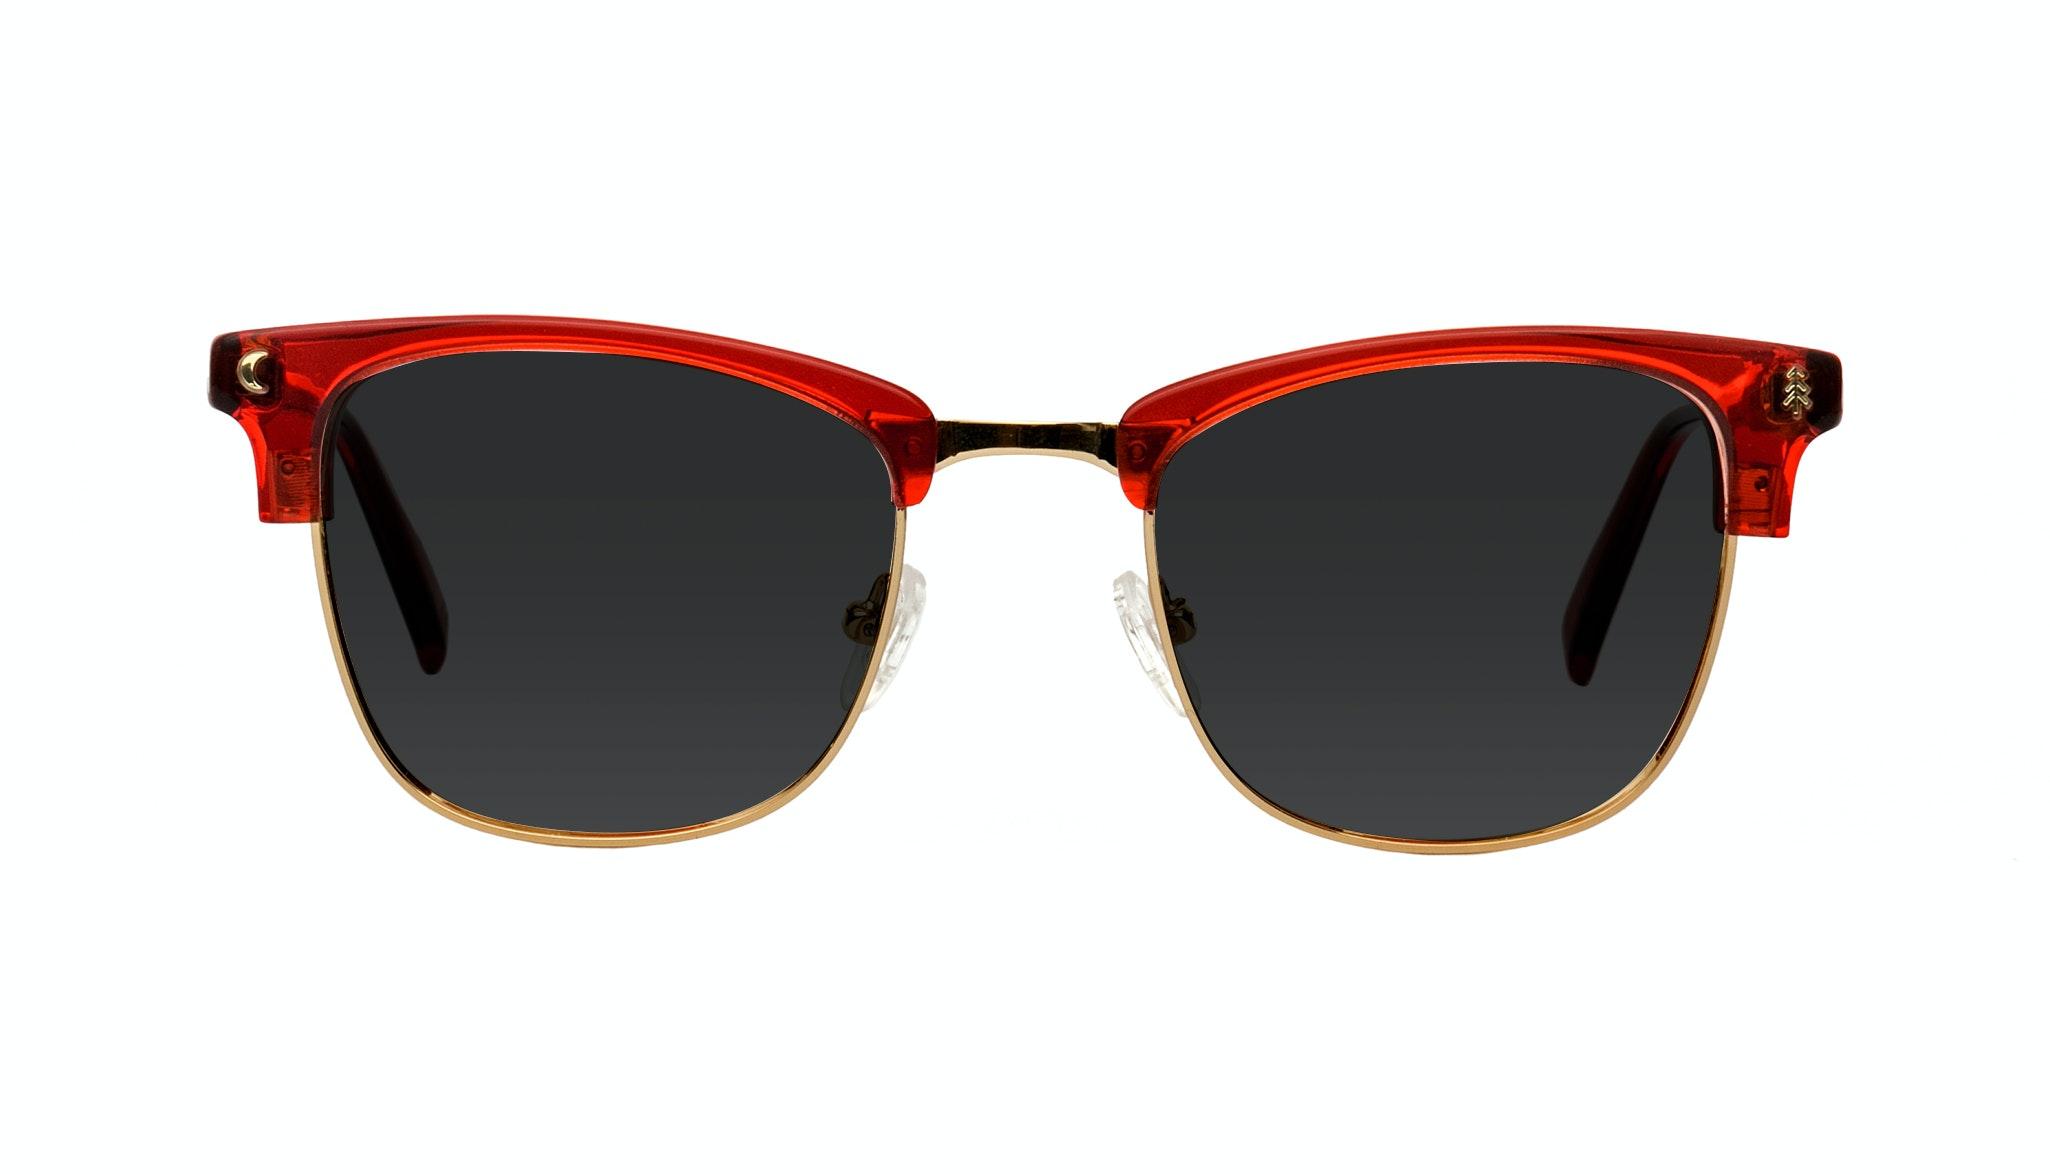 Affordable Fashion Glasses Rectangle Sunglasses Women Stargazer Kindled Red